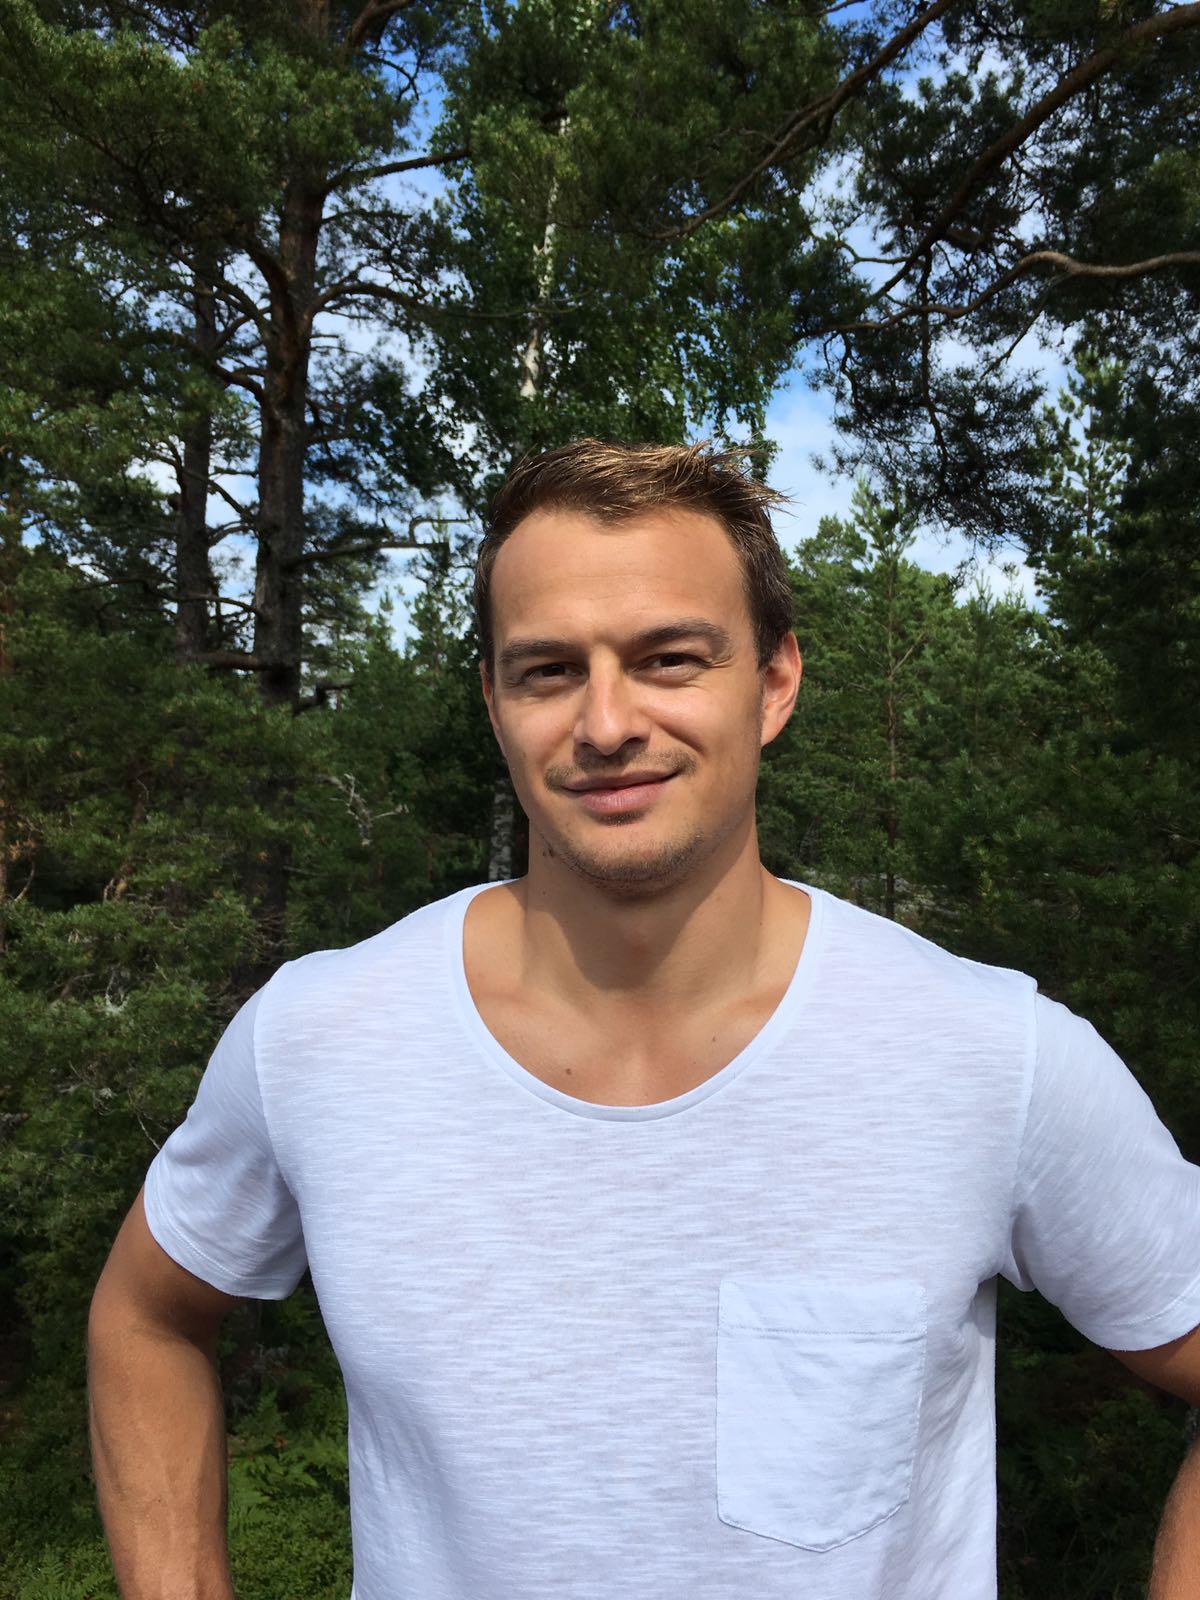 Finnischer Rekordnationalspieler